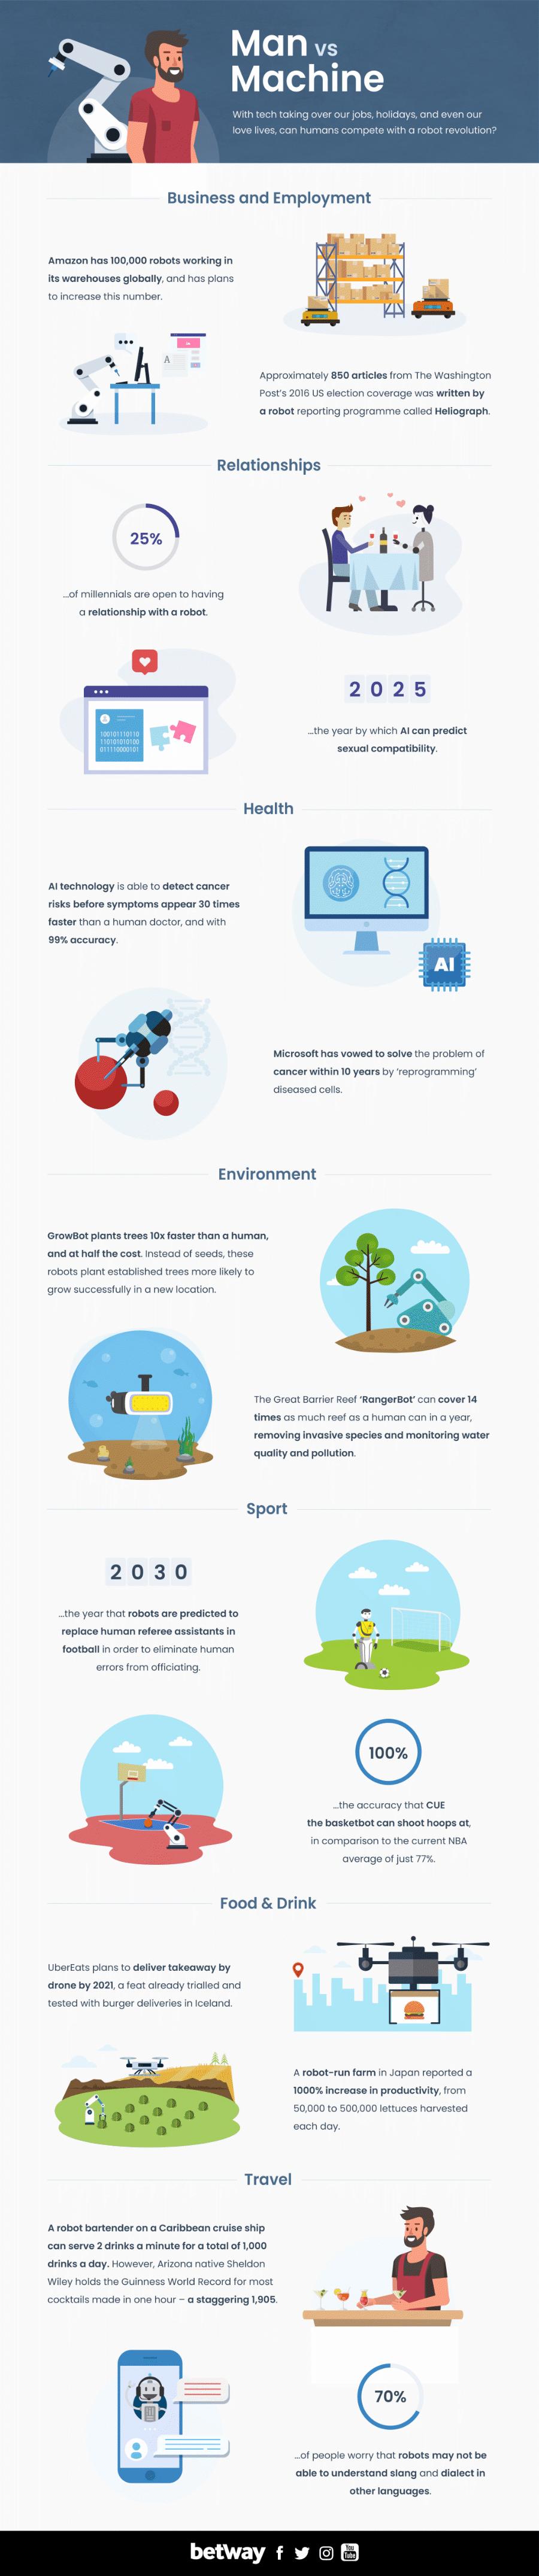 robots ai infographic